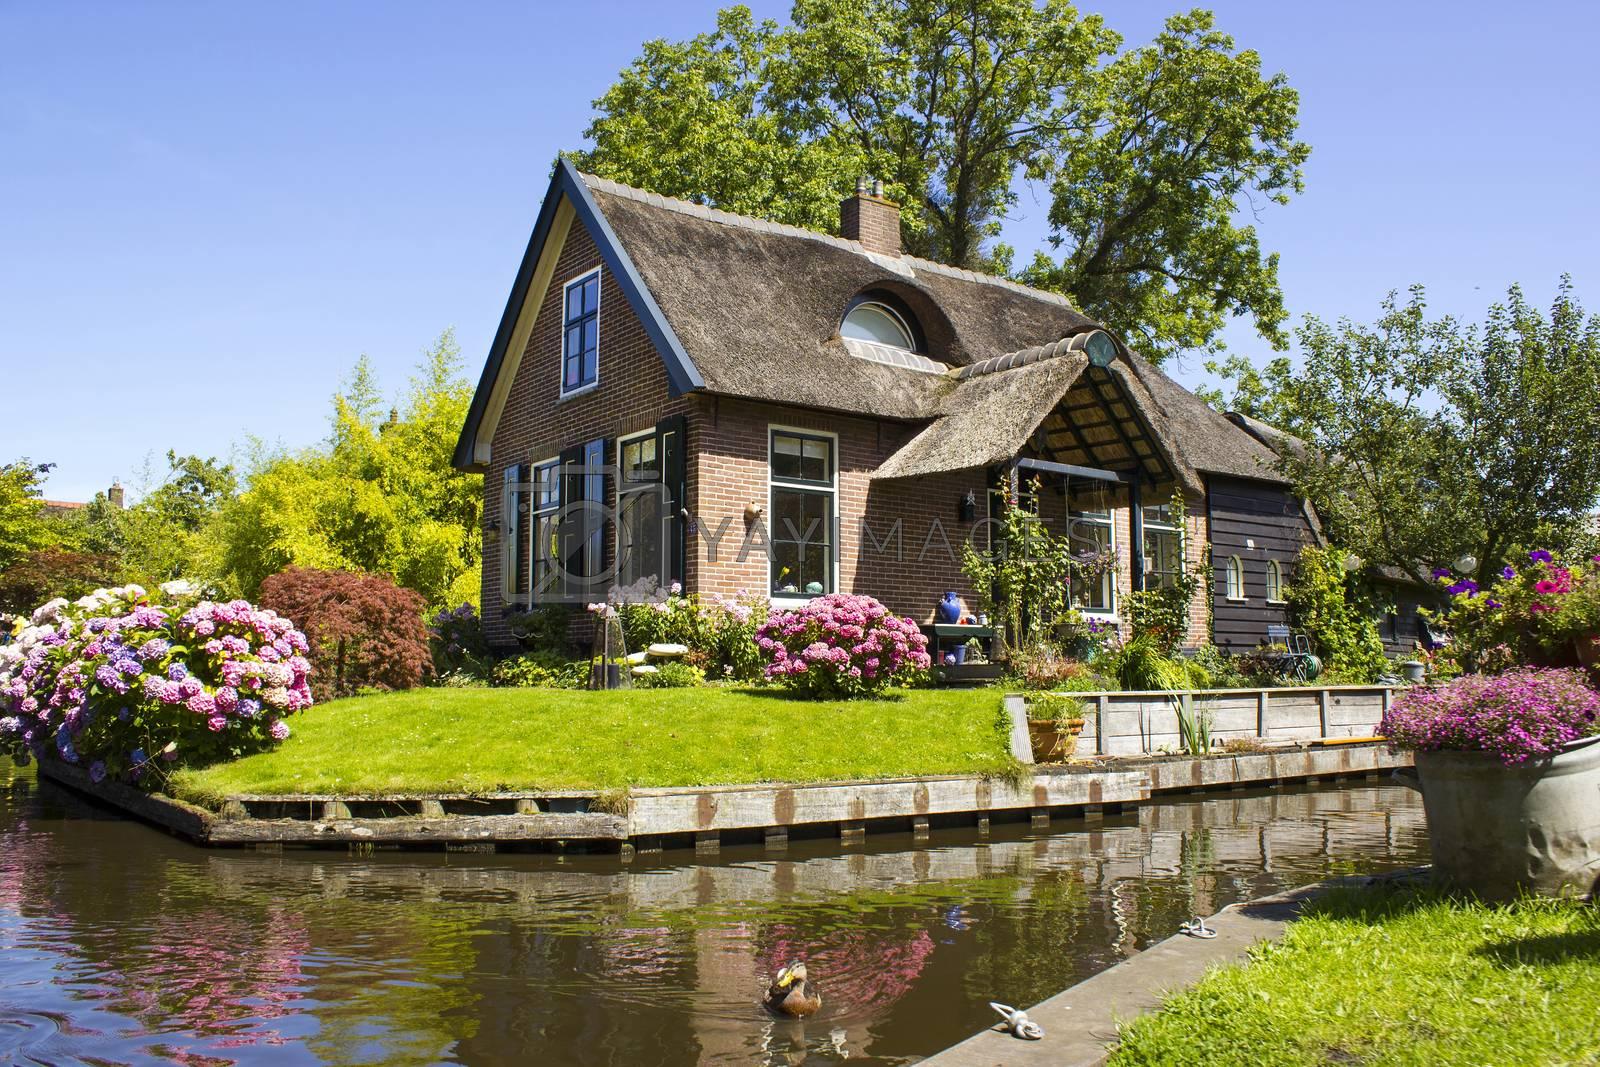 Royalty free image of GIETHOORN, NETHERLANDS by miradrozdowski